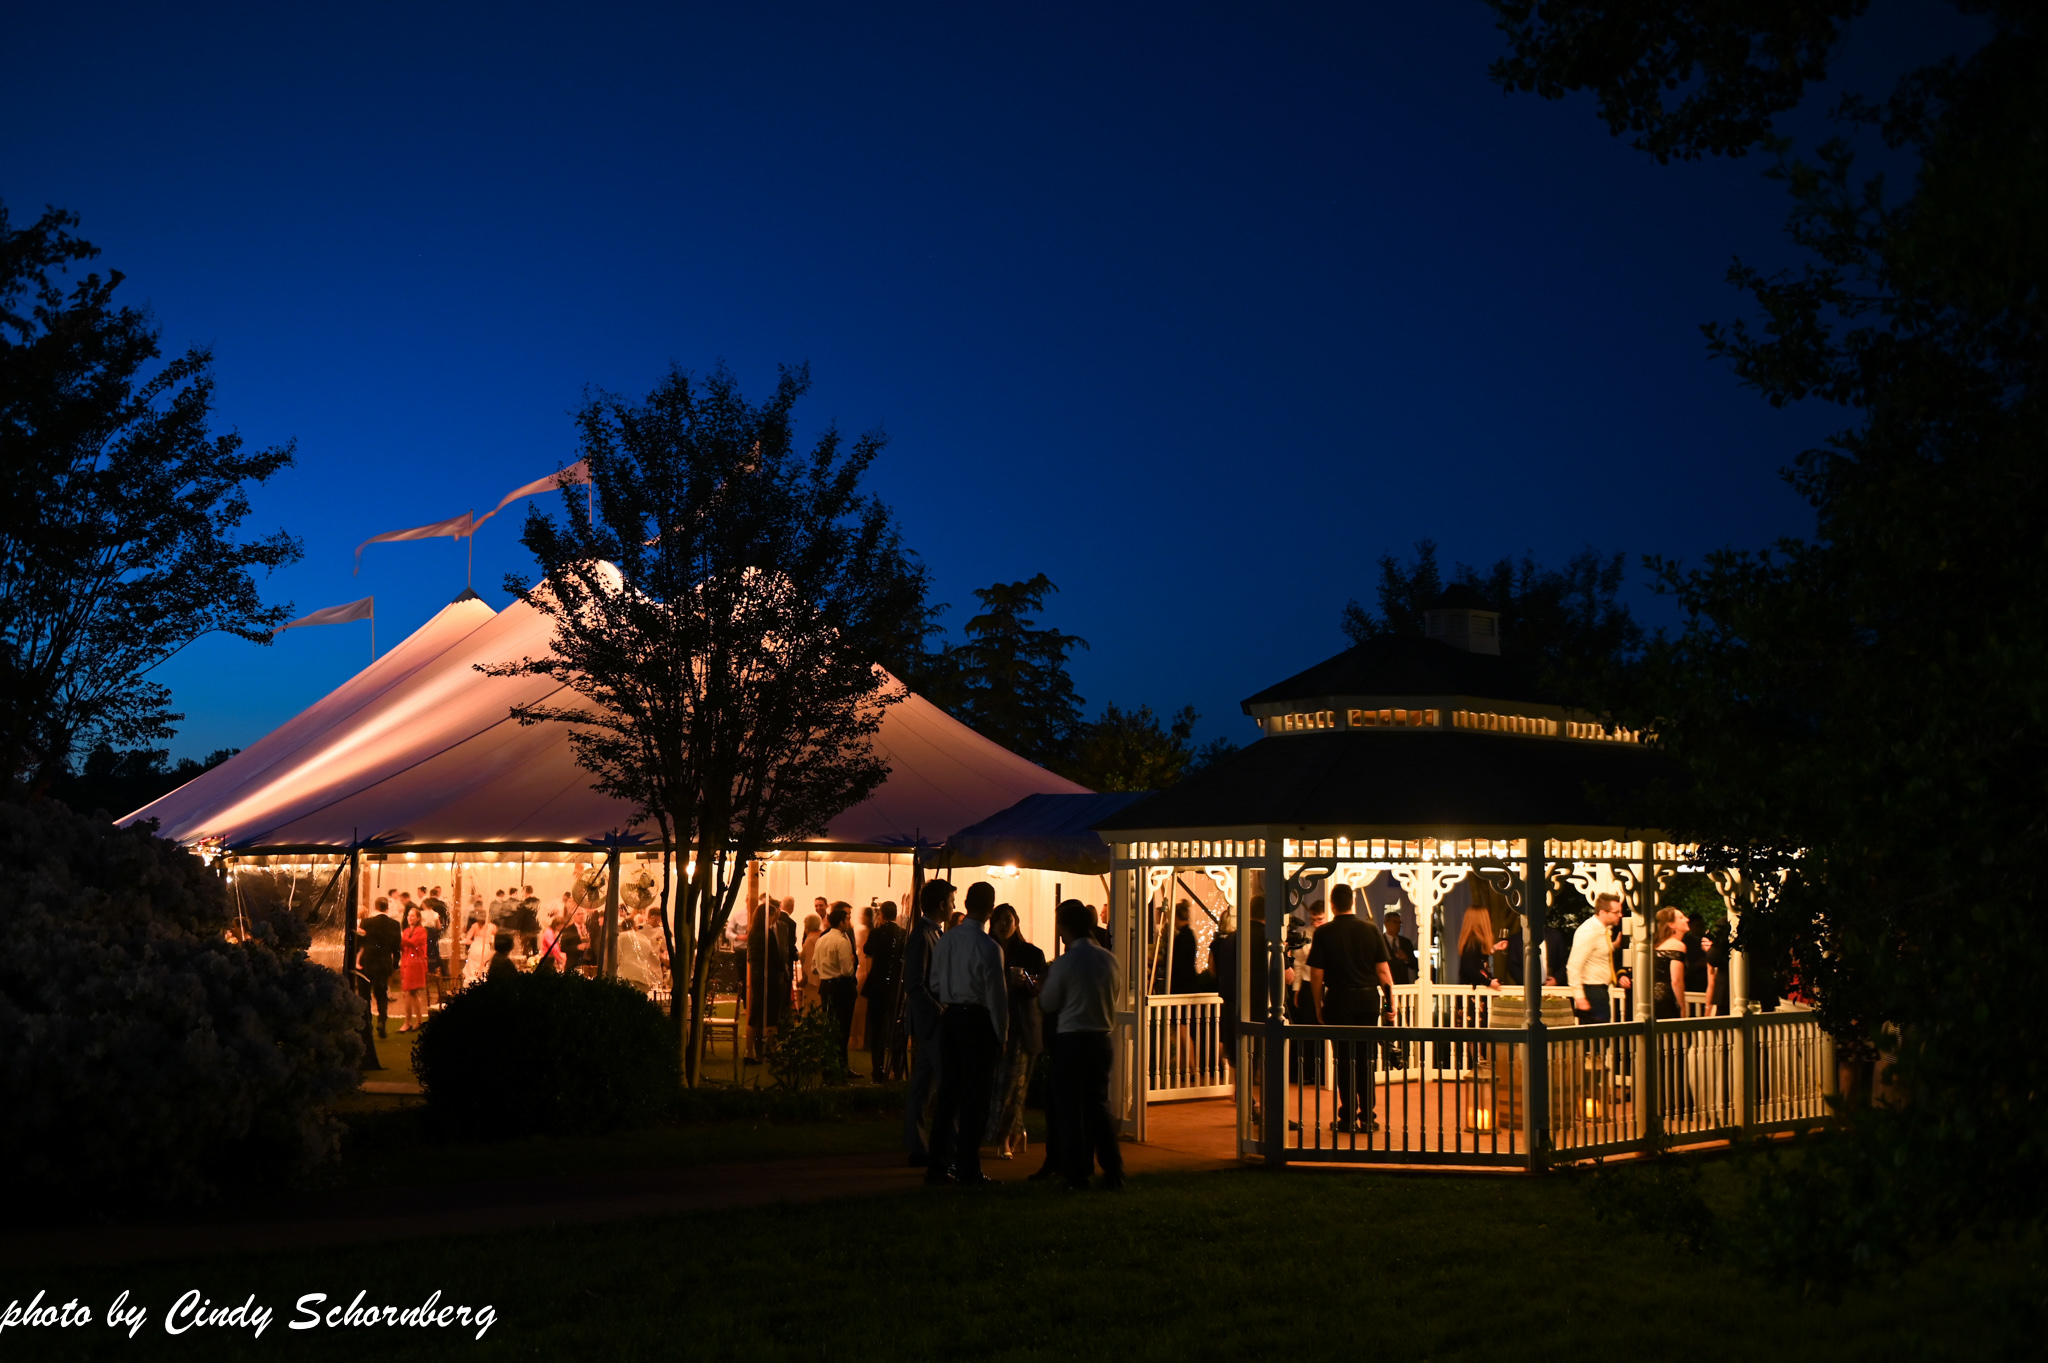 virginia_charlottesville_wedding_020.jpg